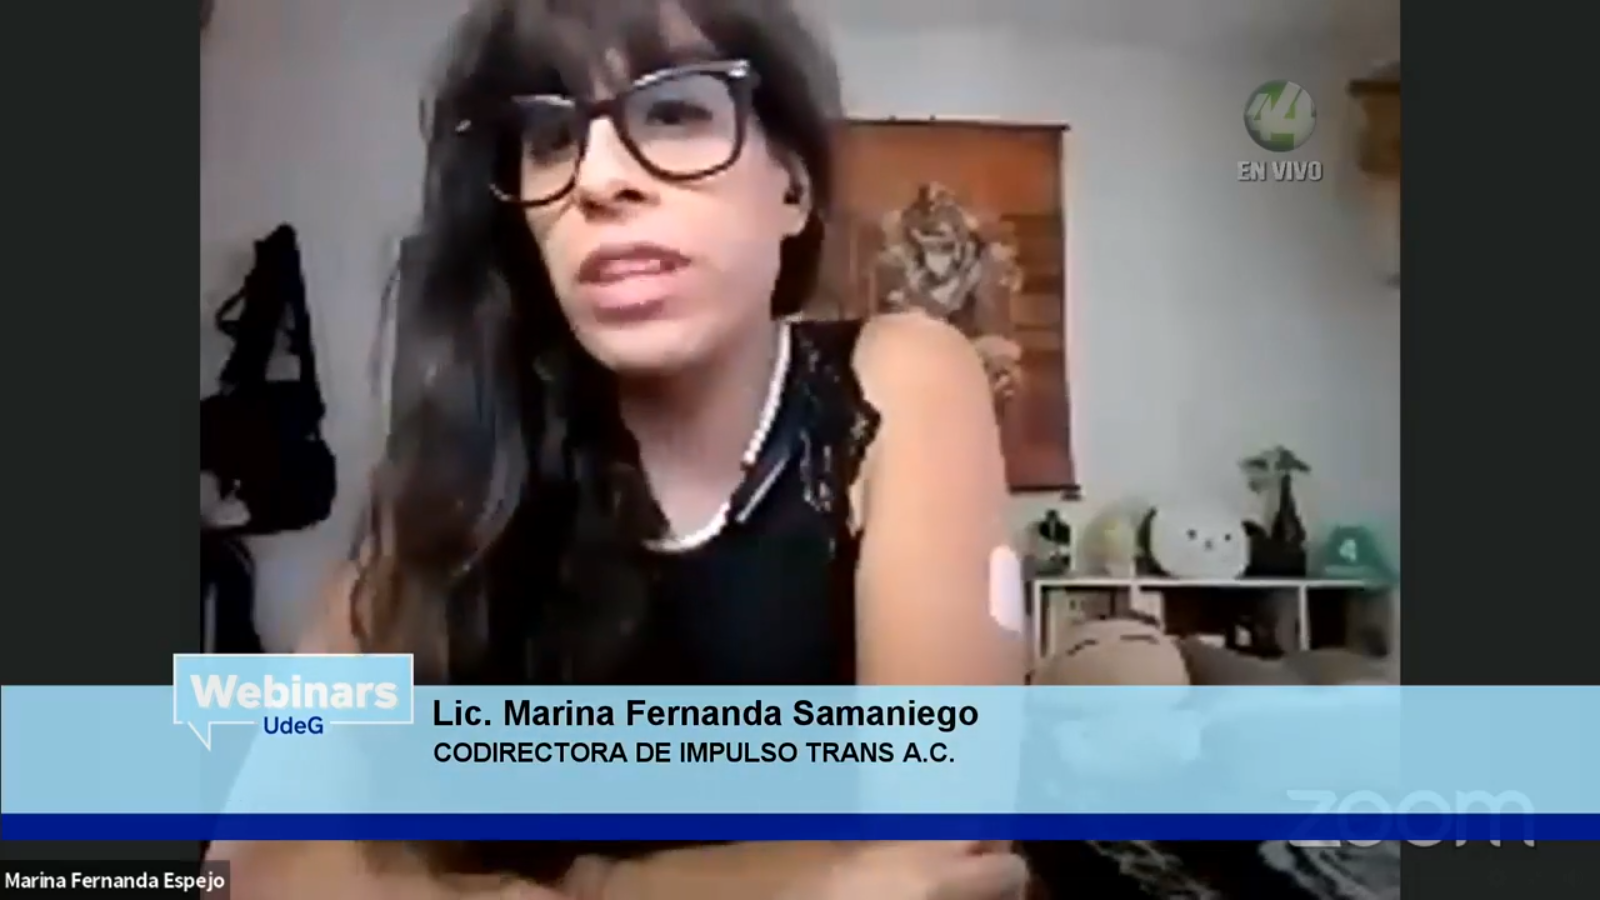 La Codirectora de Impulso Trans, AC, e Incidir AC, Marina Fernanda Samaniego